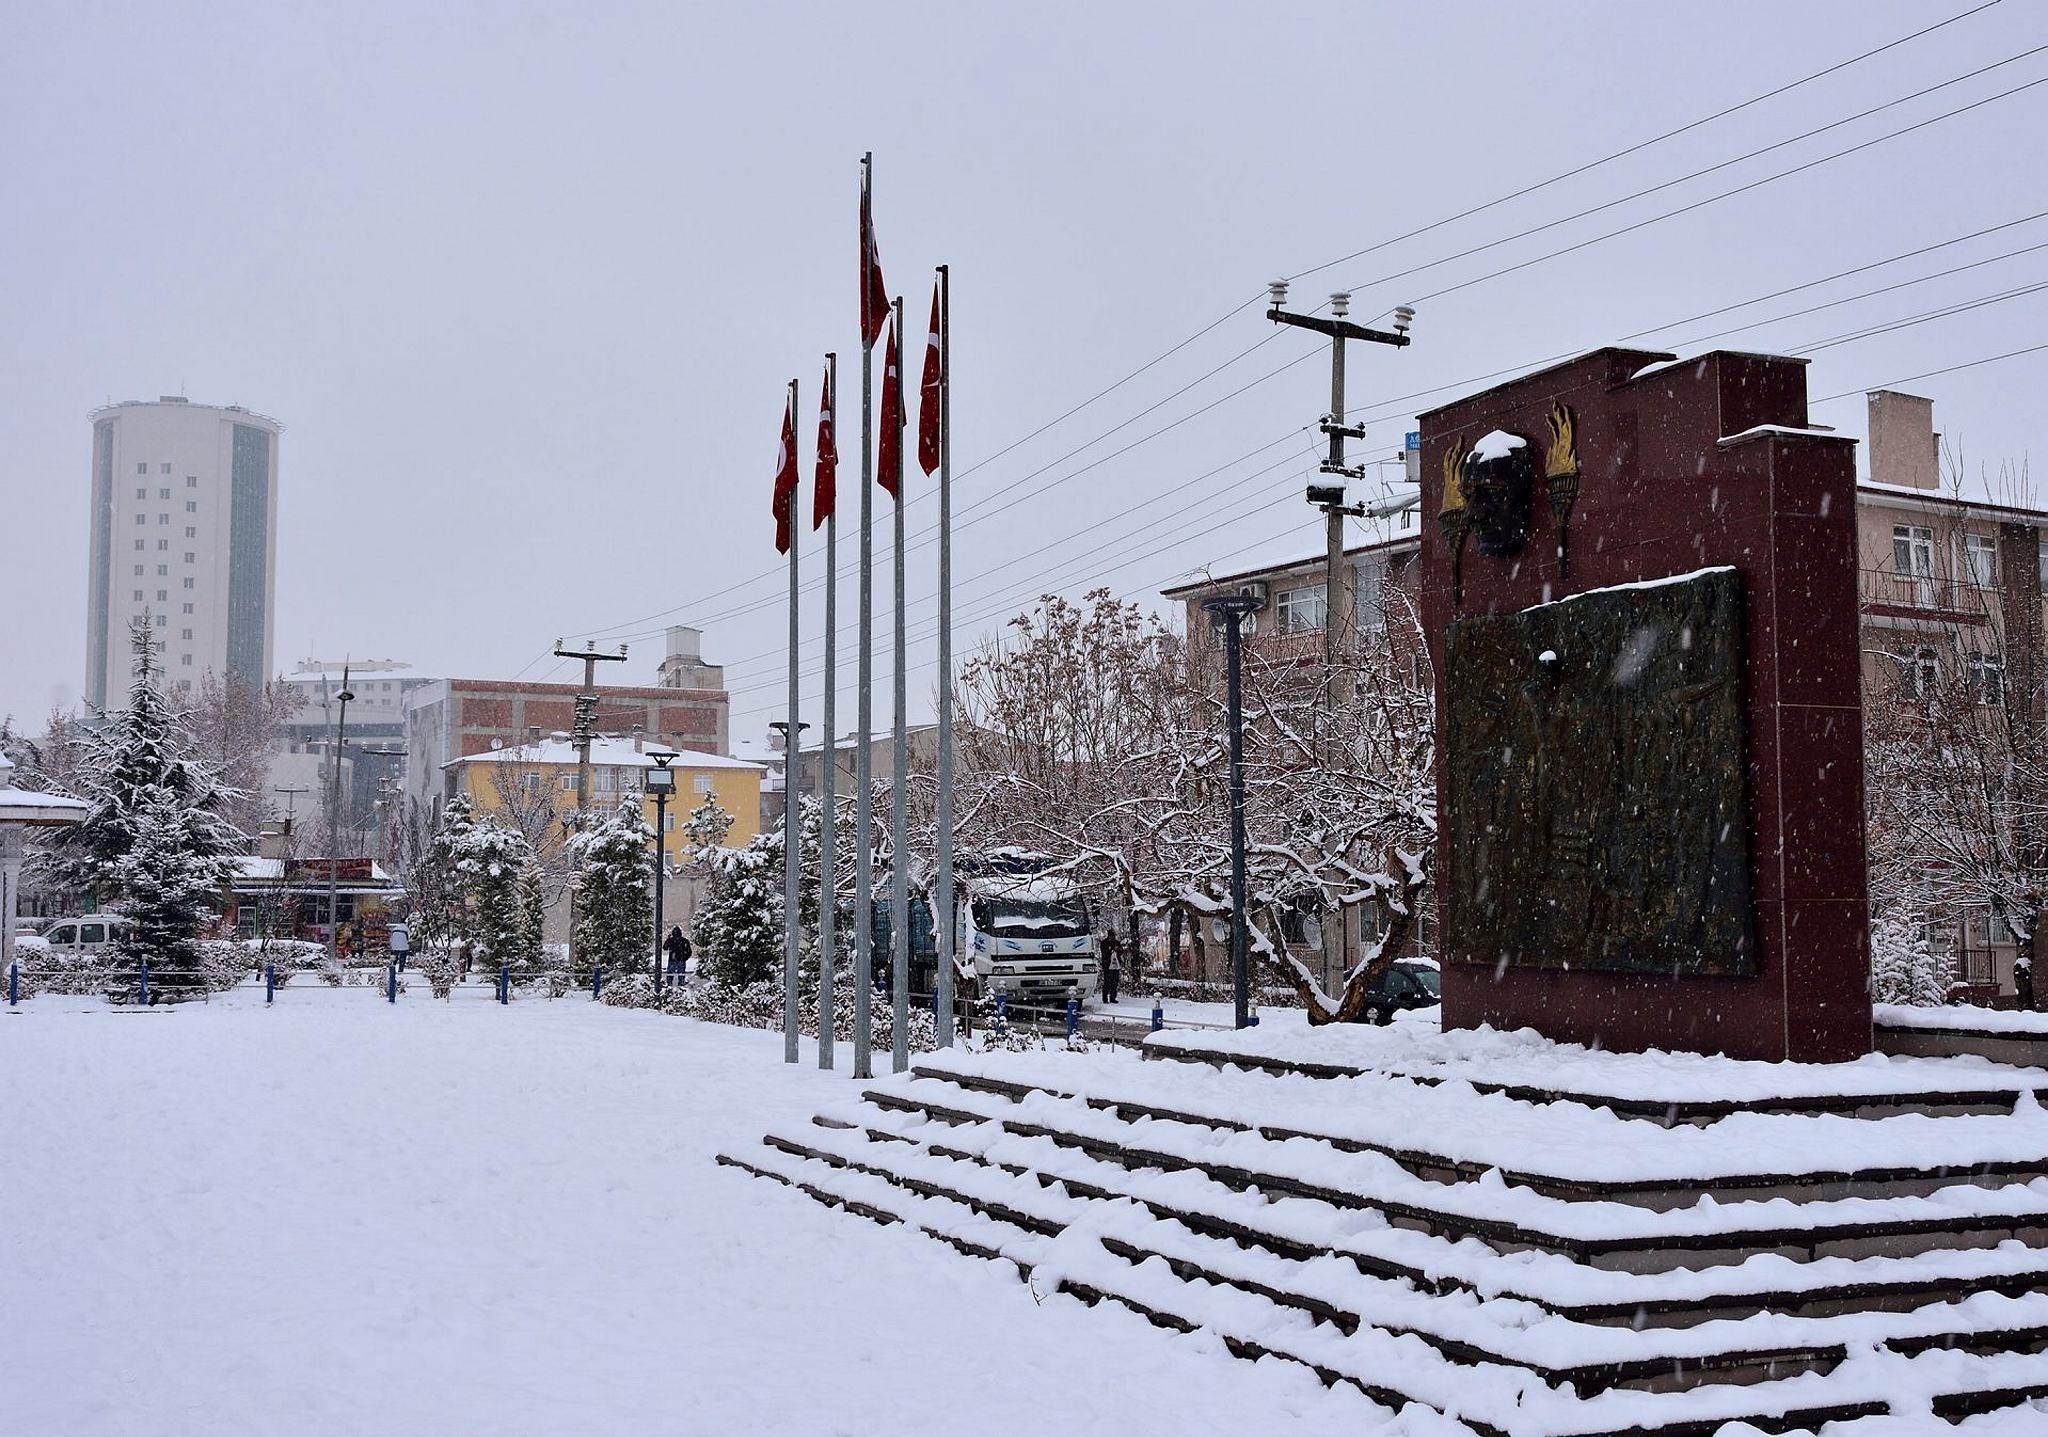 Center of Kahramankazan district of Ankara